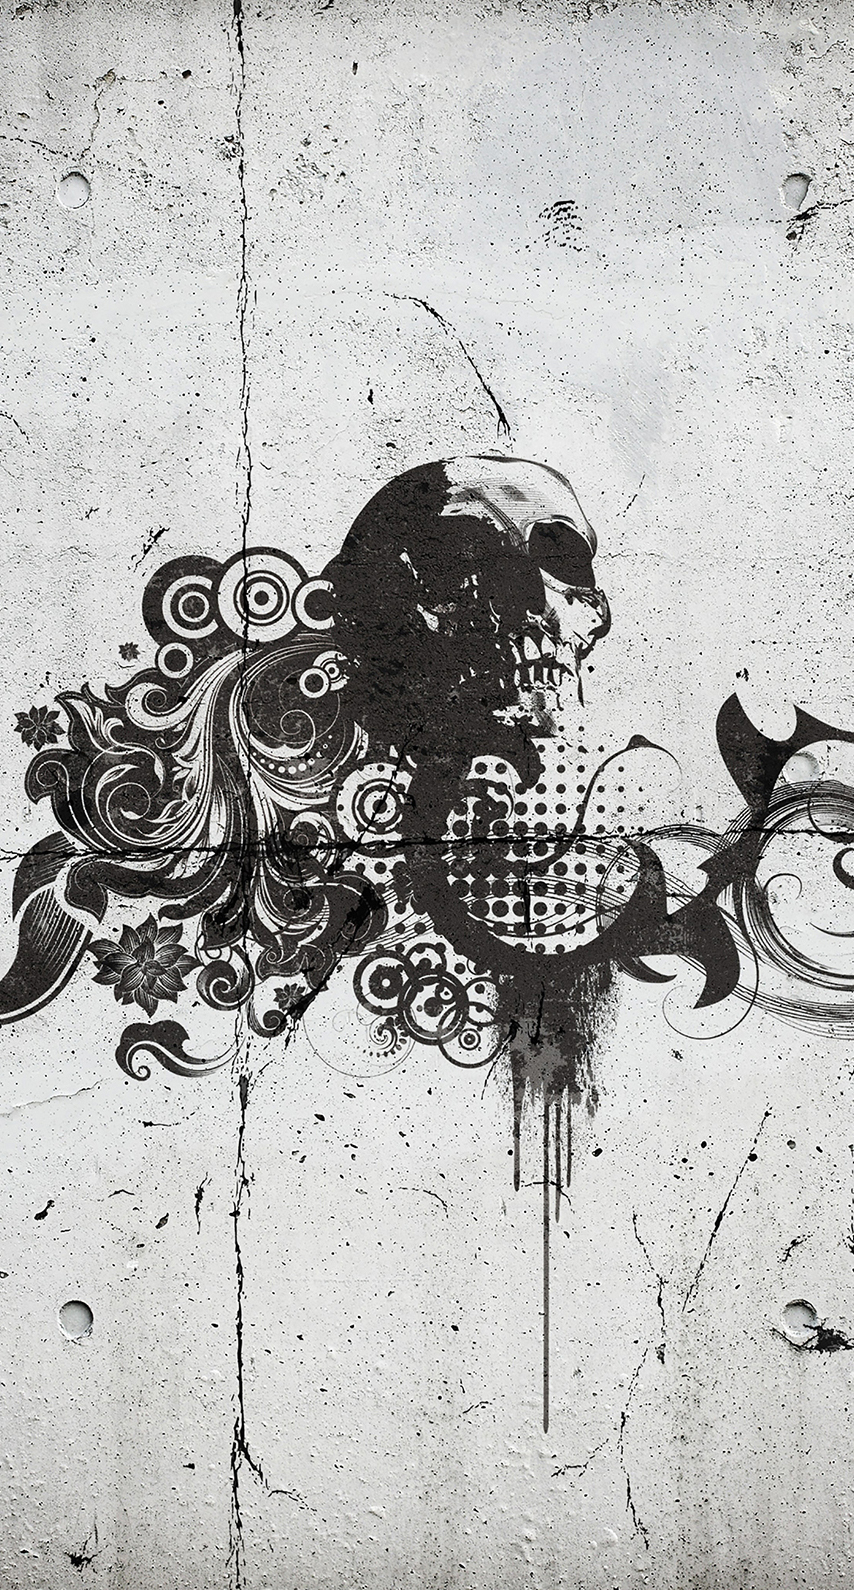 artwork, visual arts